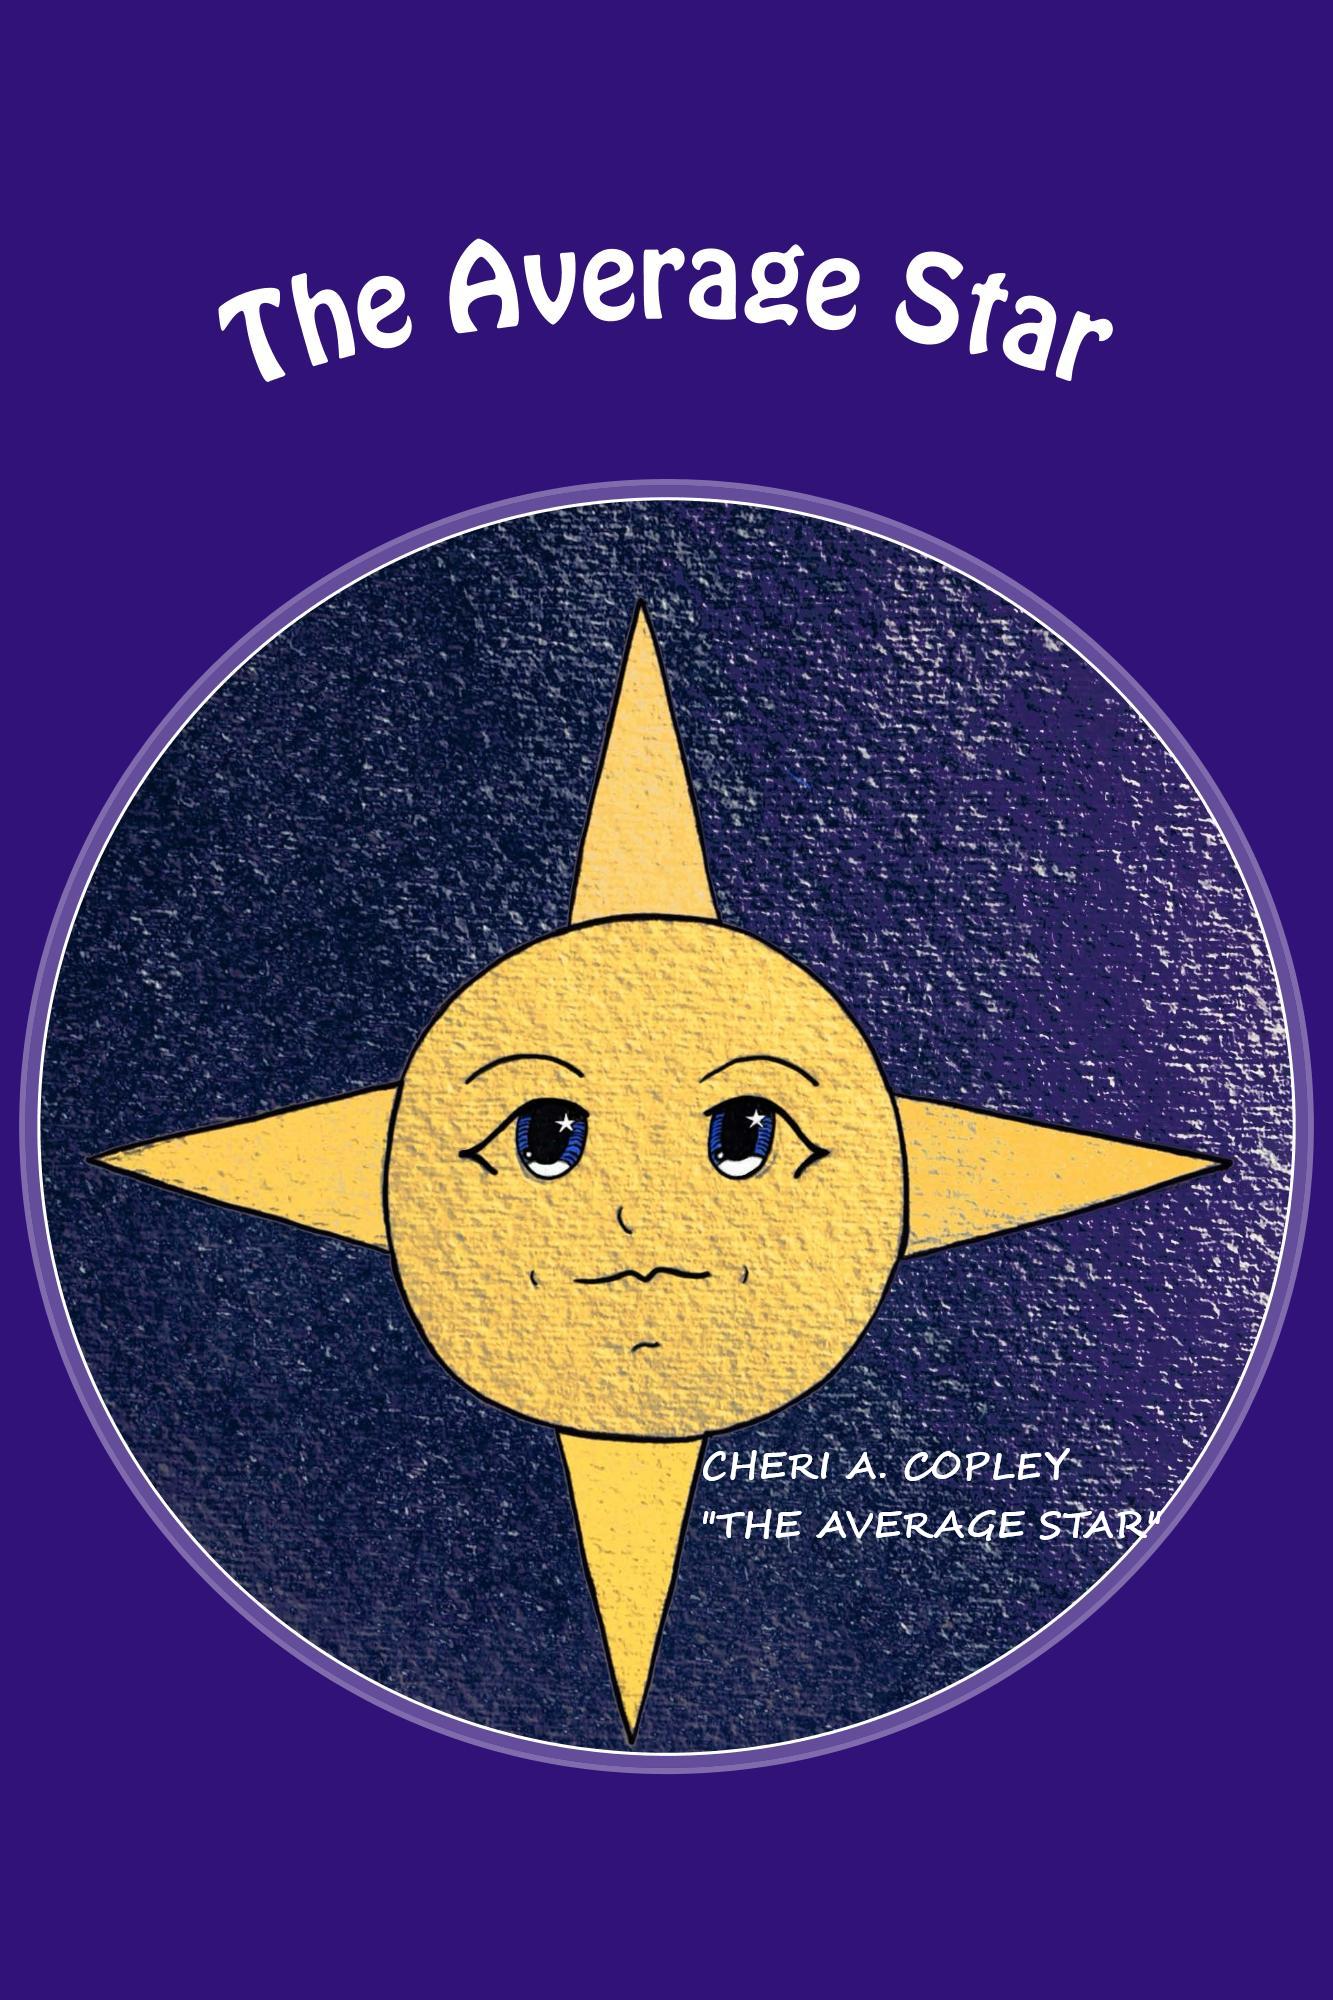 The Average Star